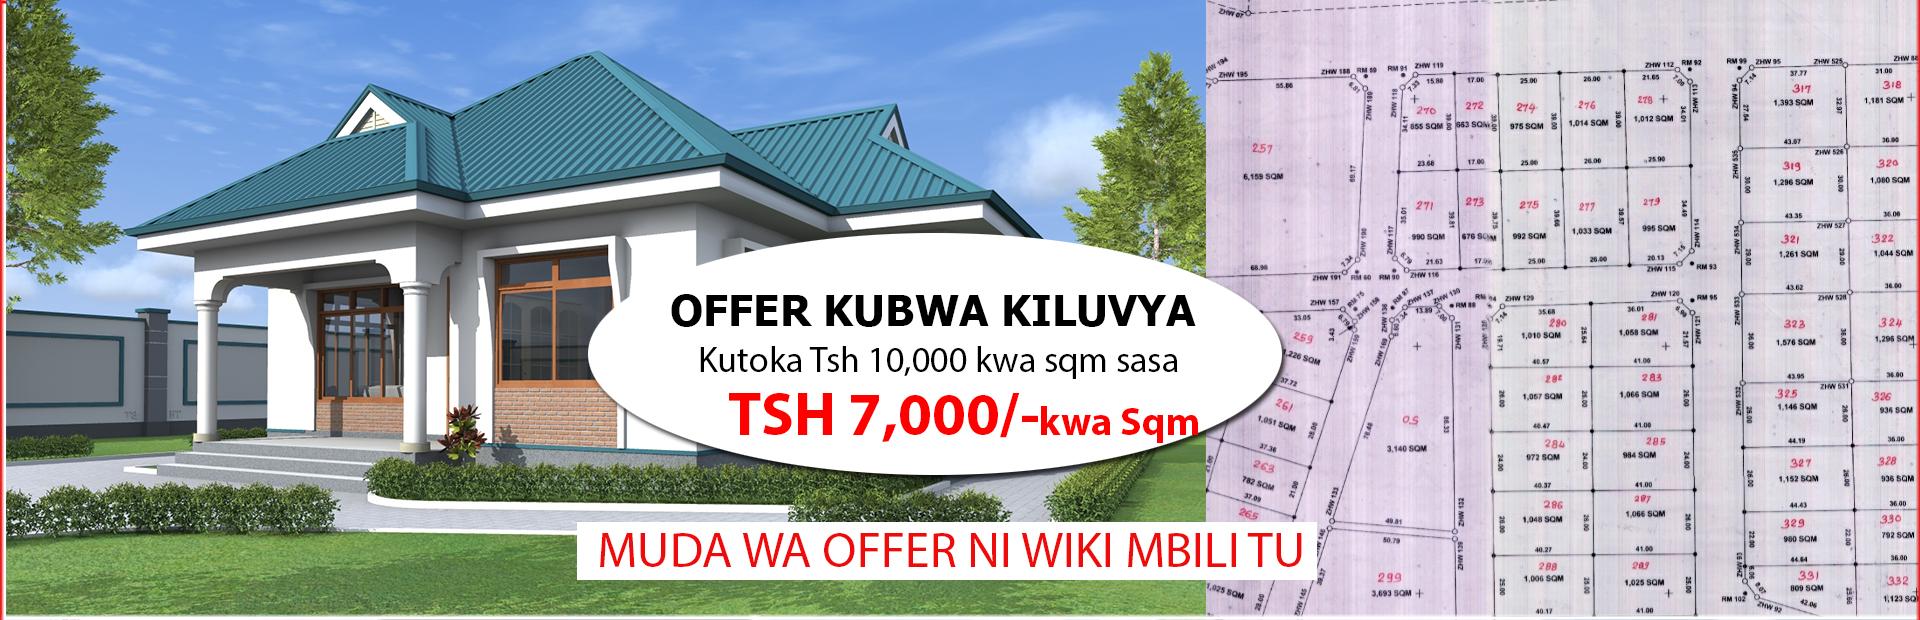 Offer Kabambe Kiluvya